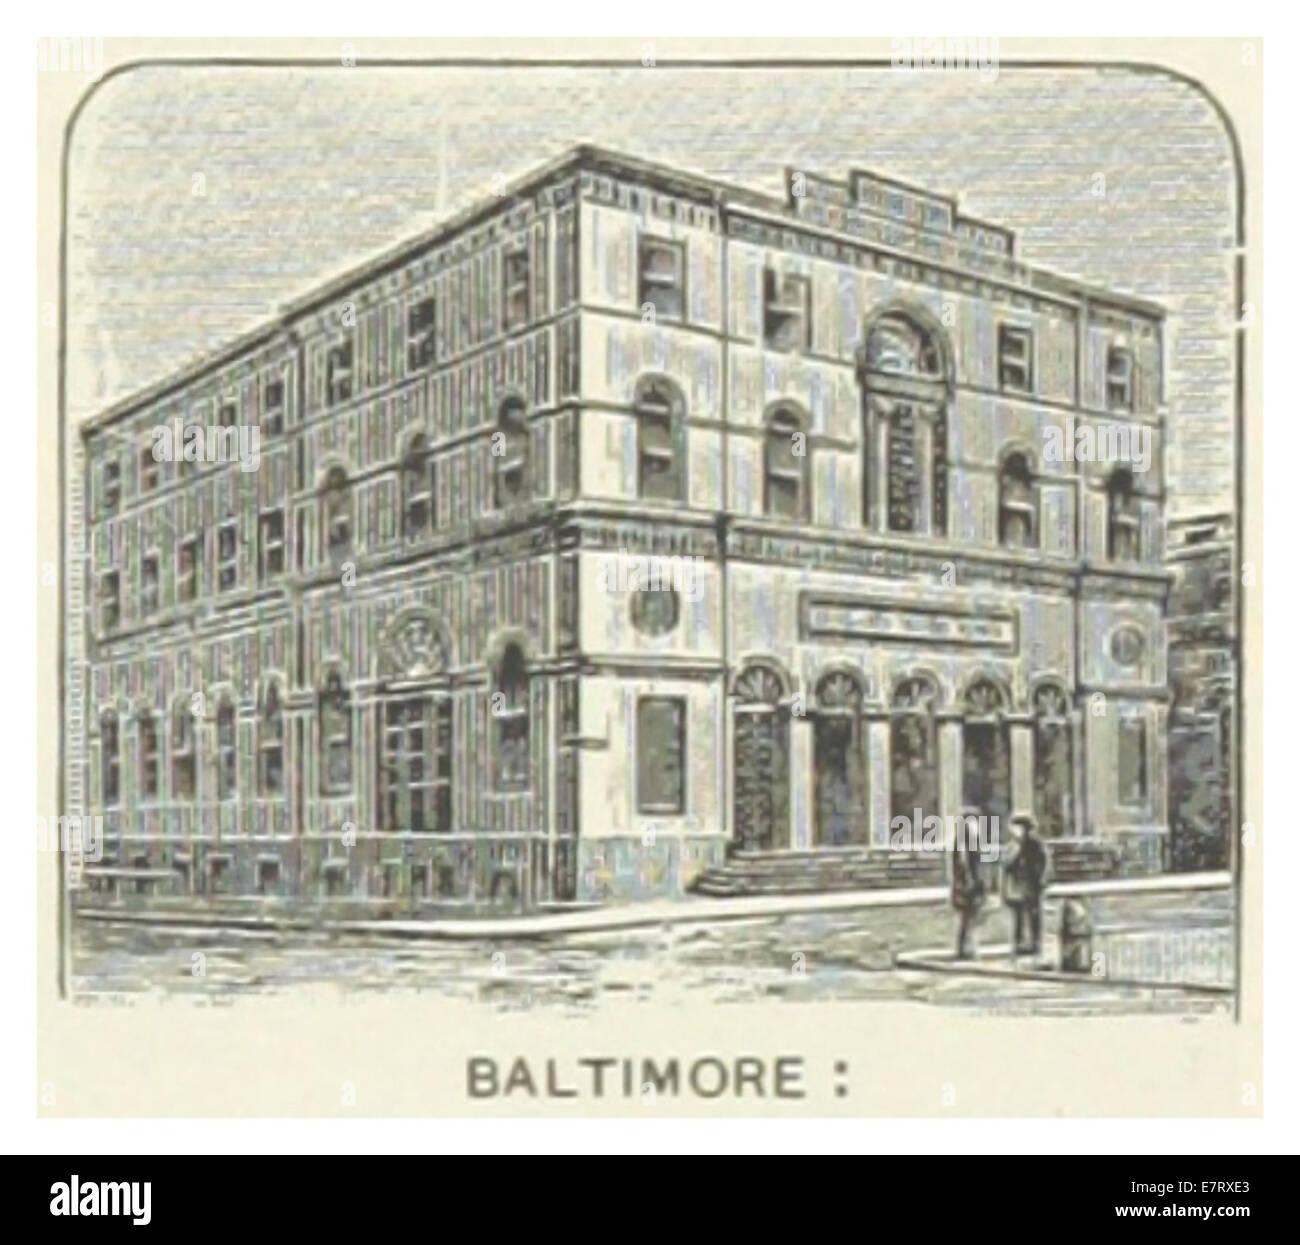 US-MD(1891) p337 BALTIMORE, MERCHANT'S NATIONAL BANK - Stock Image